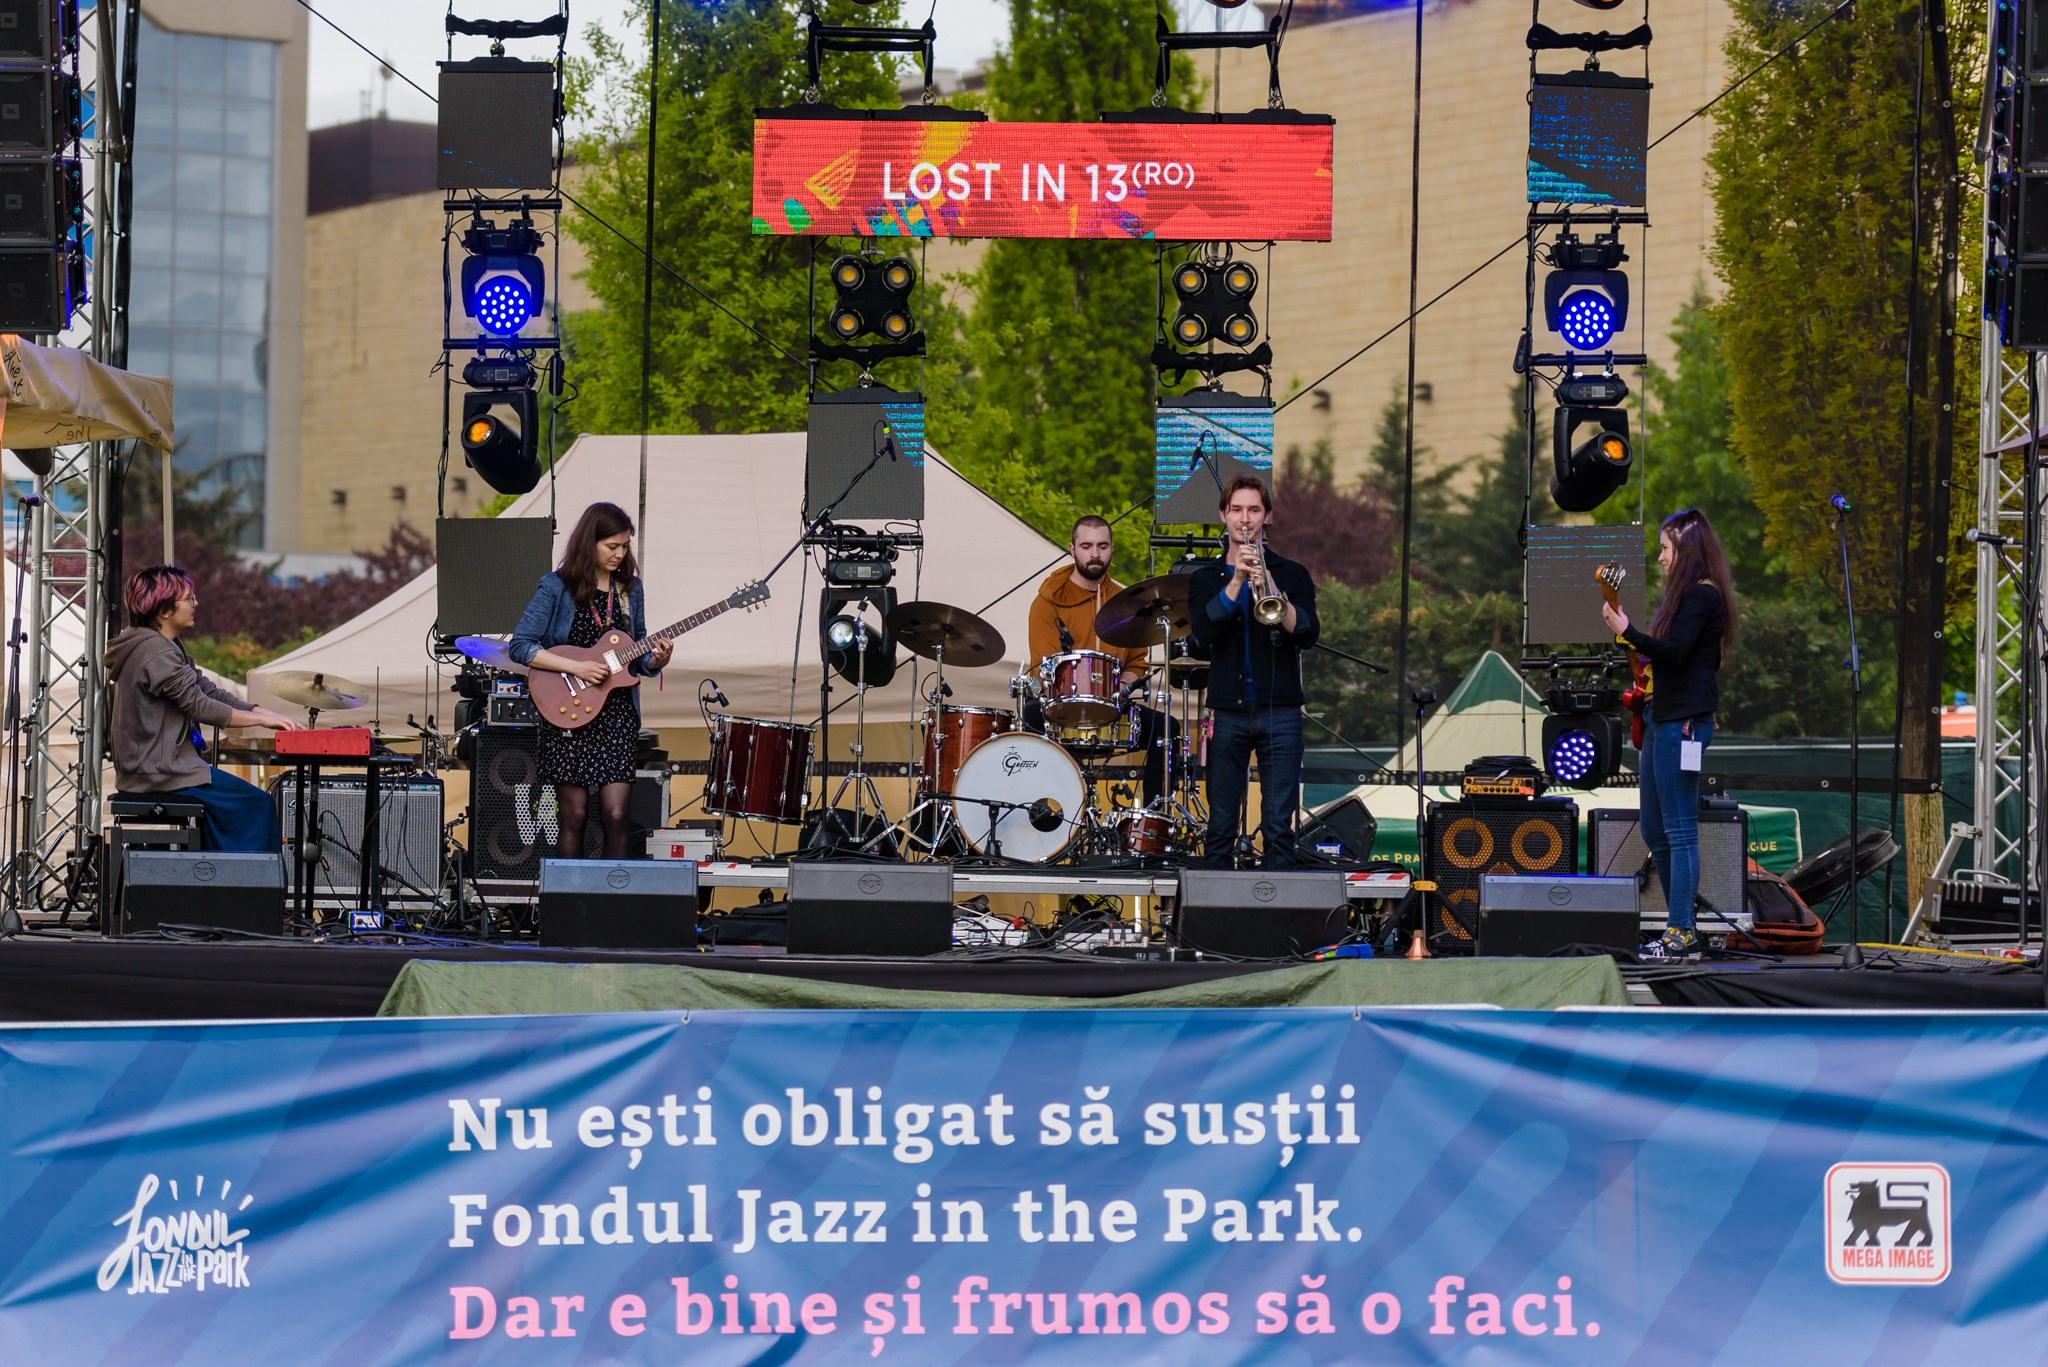 fondul jazz in the park 2019